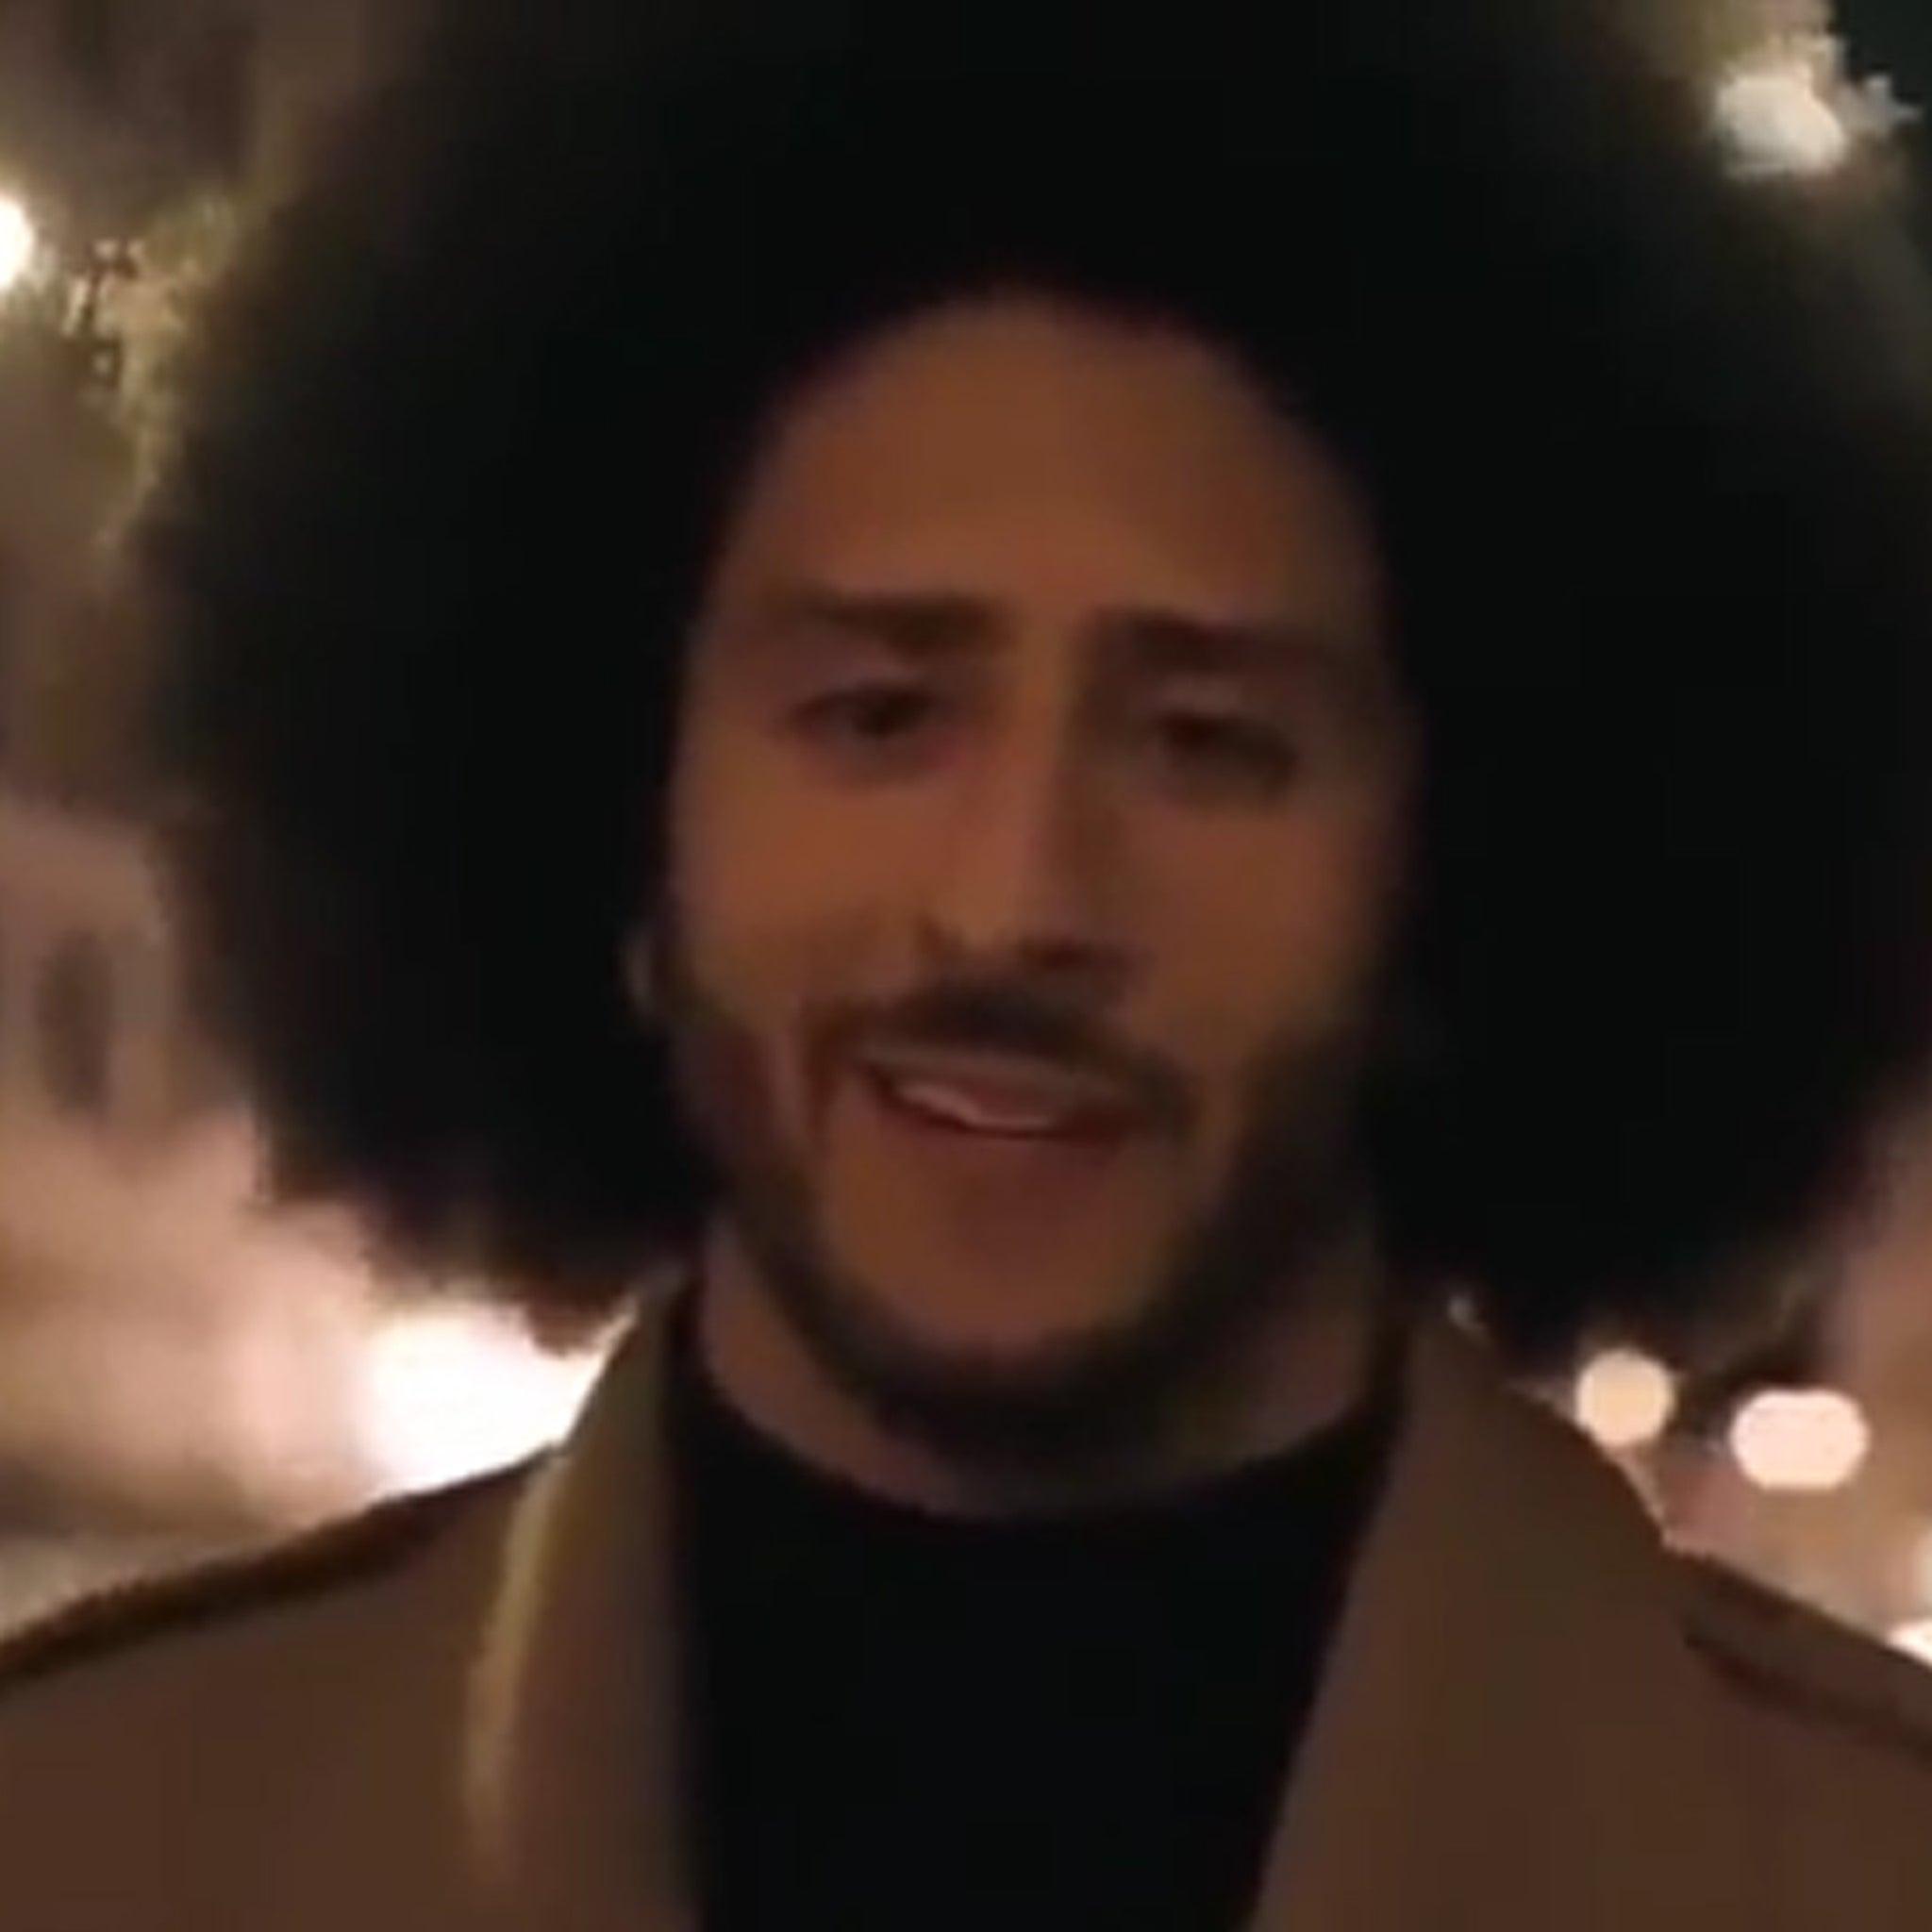 Colin Kaepernick's Nike Commercial Wins 2019 Emmy